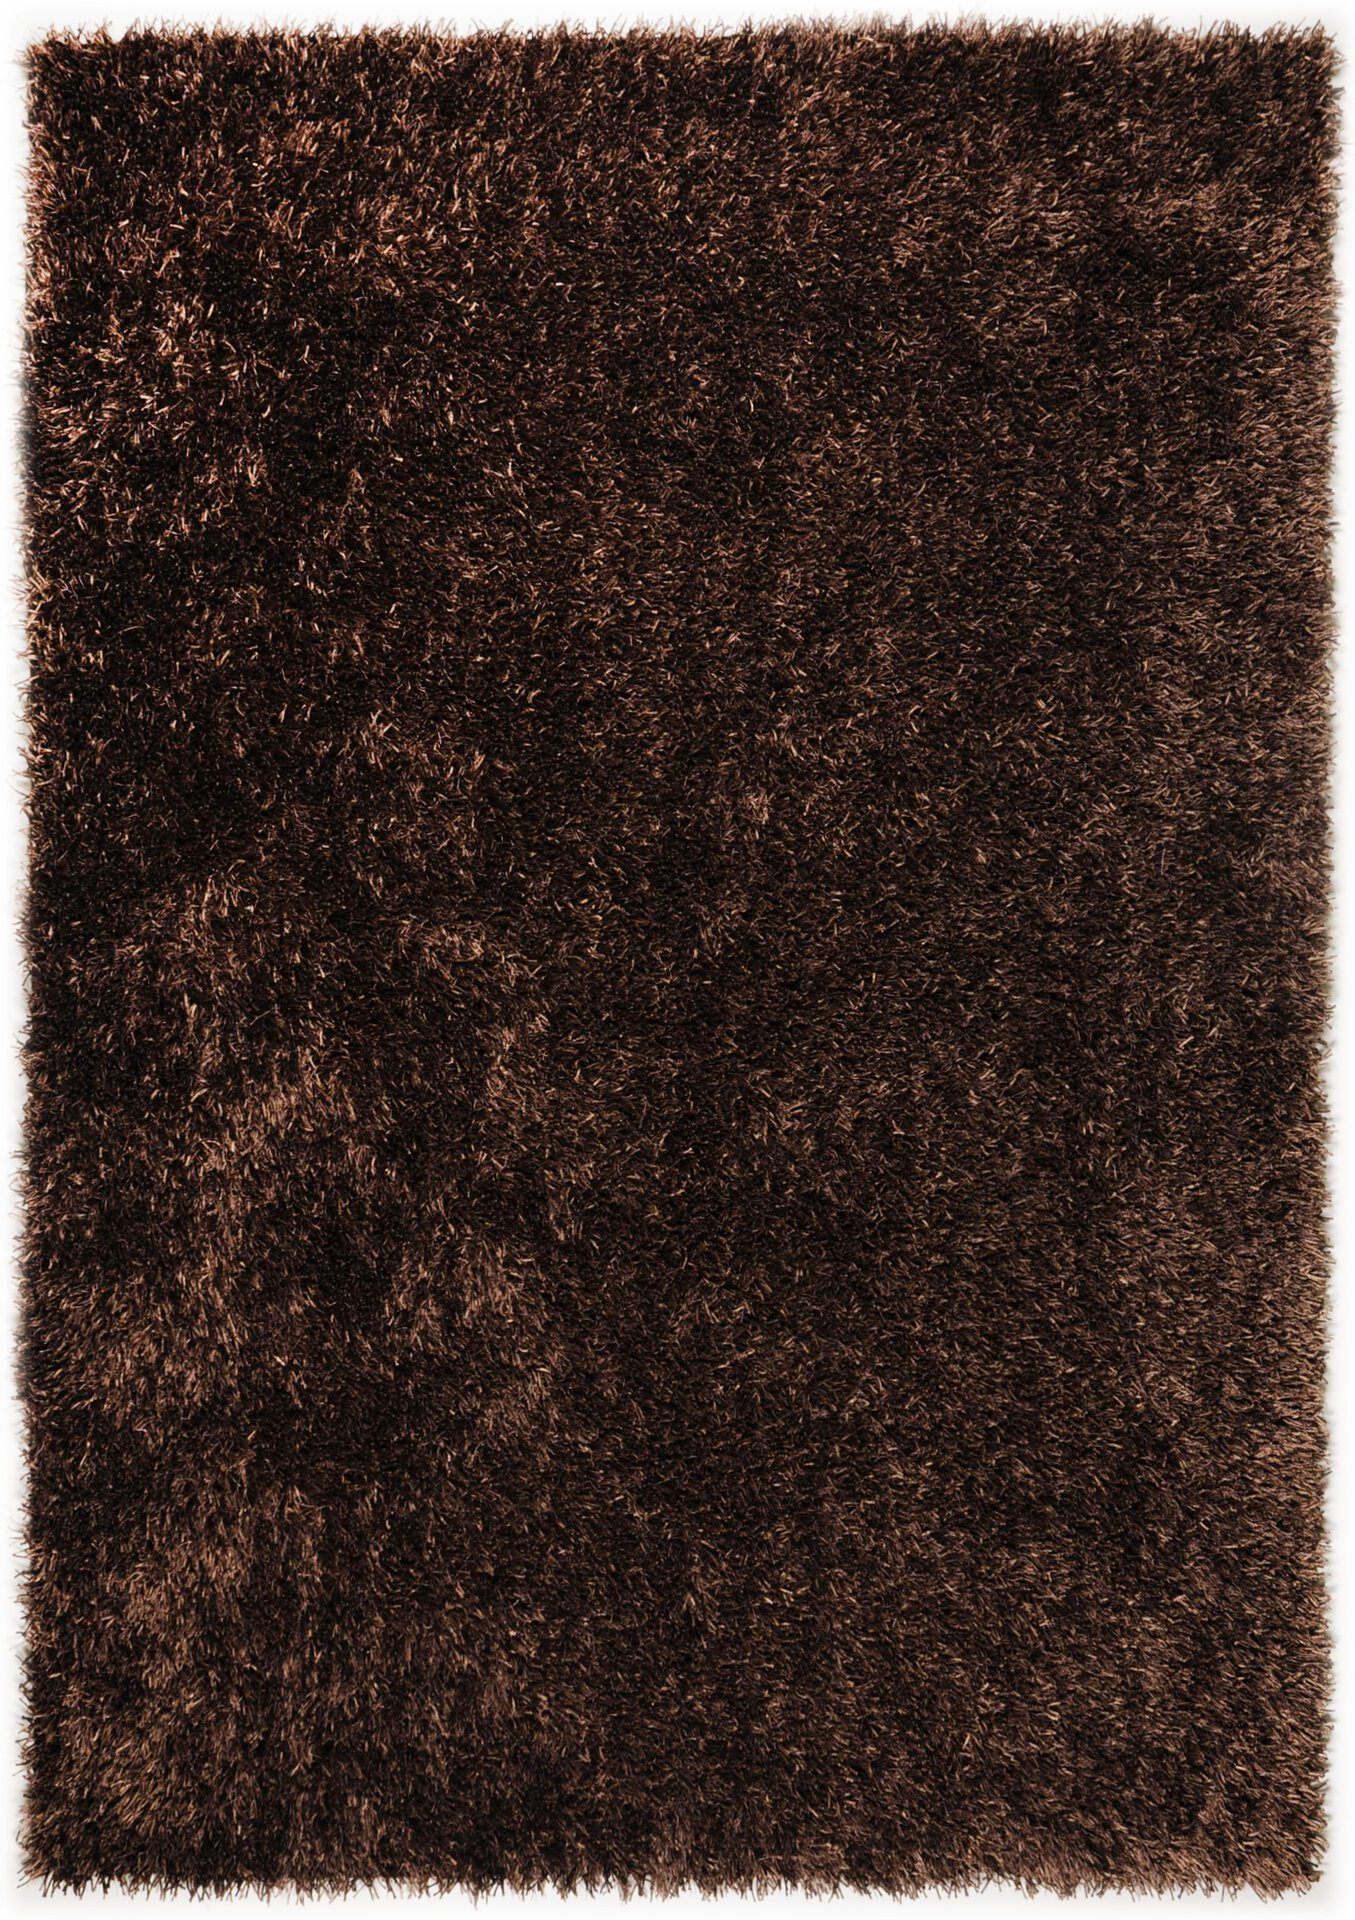 Handtuftteppich Girly Theko Textil braun 65 x 135 cm